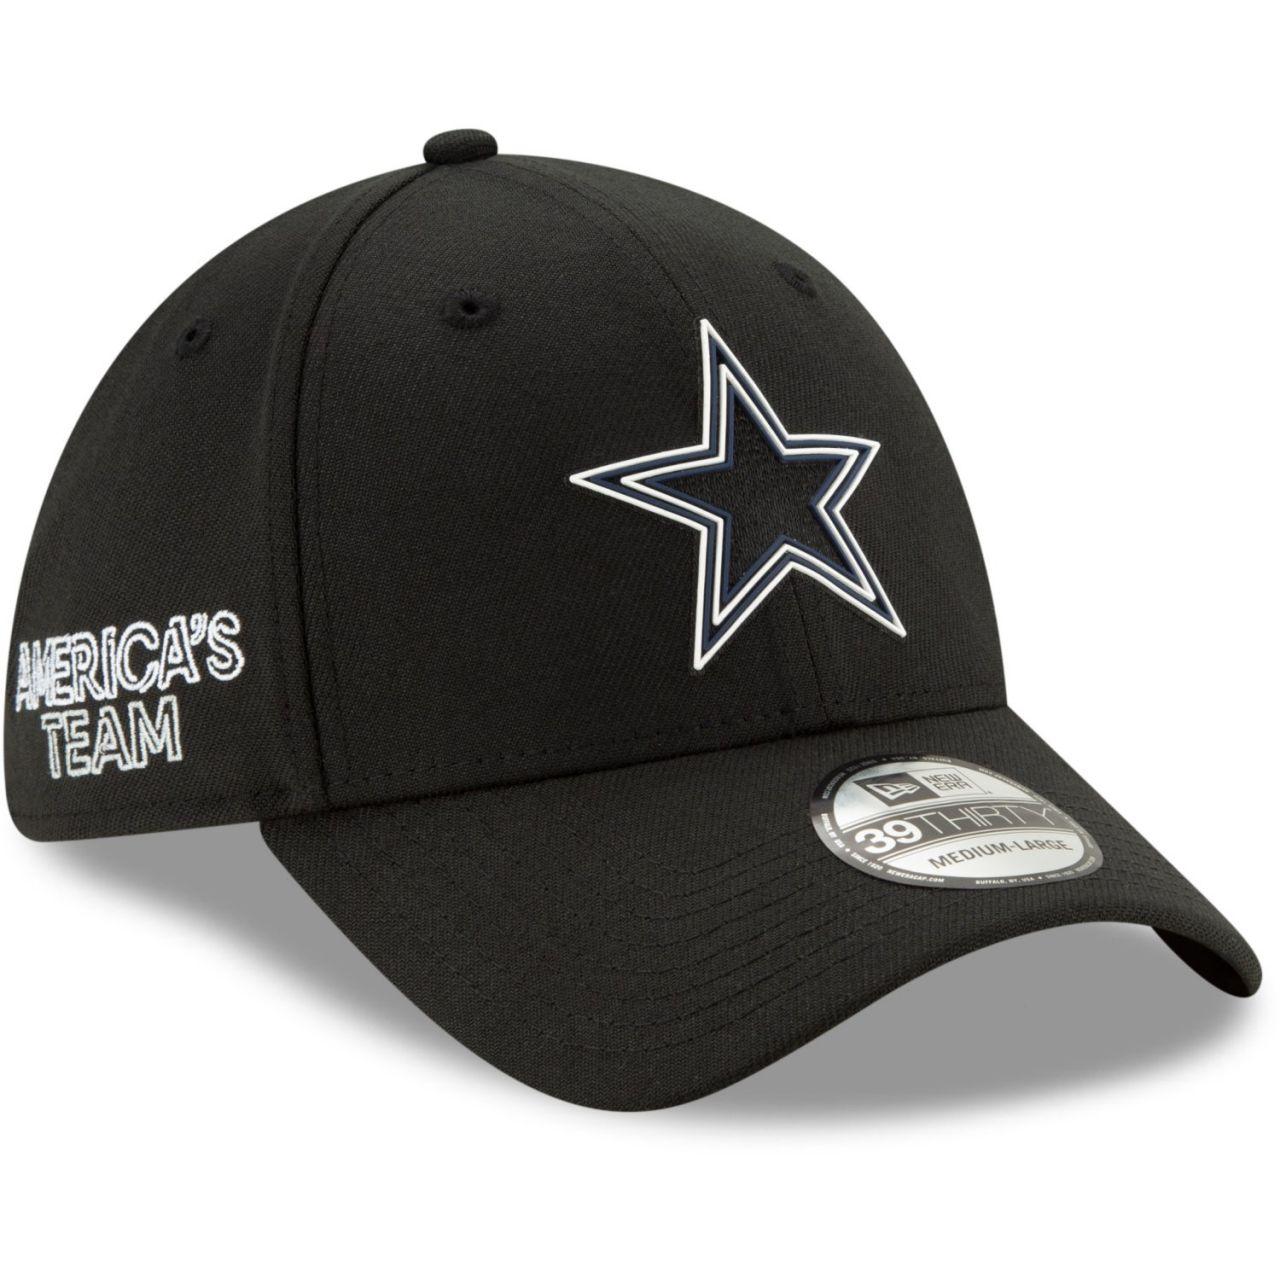 amfoo - New Era 39Thirty Cap - NFL 2020 DRAFT Dallas Cowboys